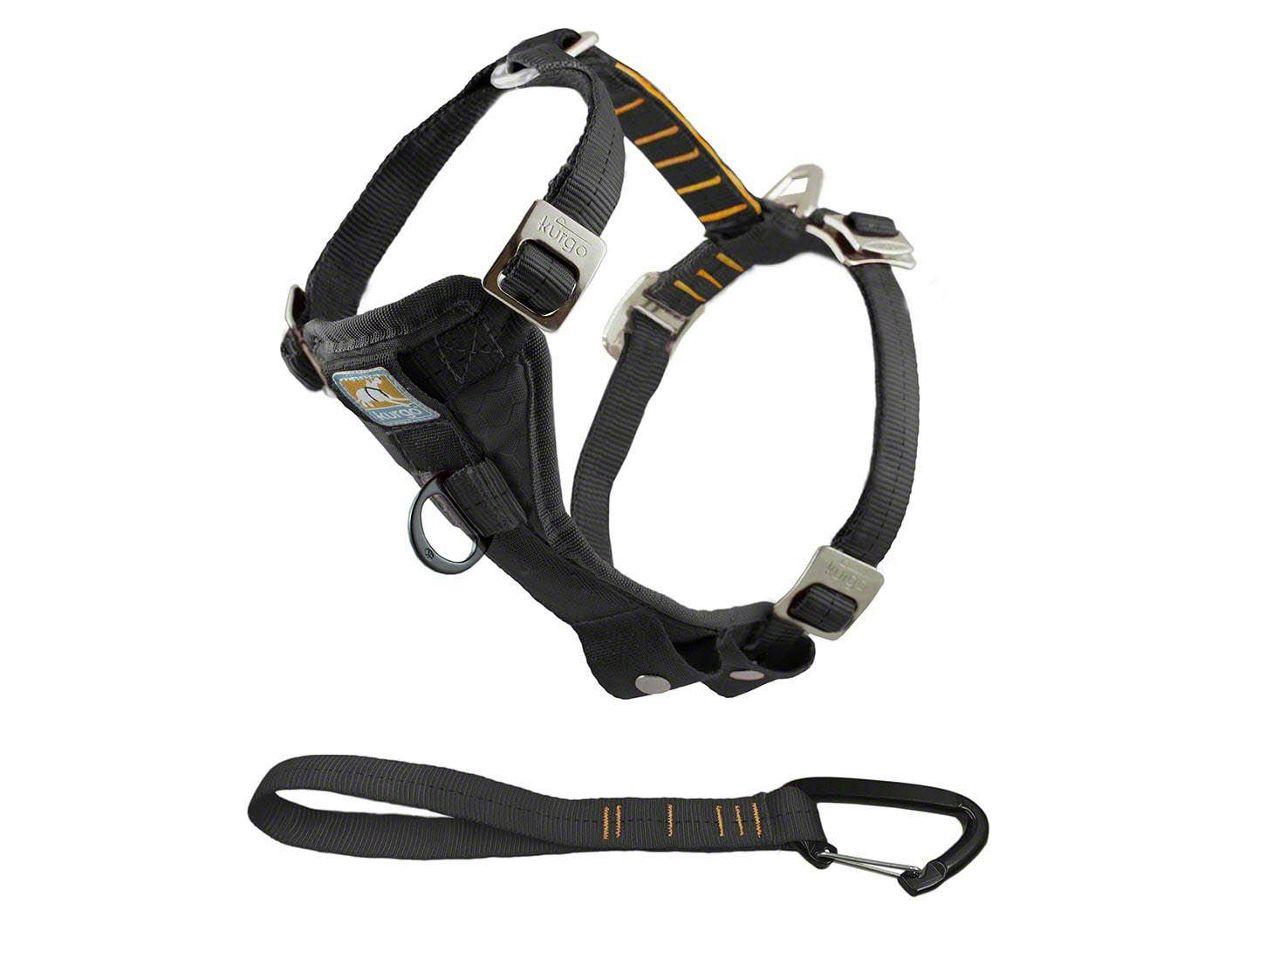 Kurgo Enhanced Strength TruFit Dog Car Harness (07-18 Sierra 1500)